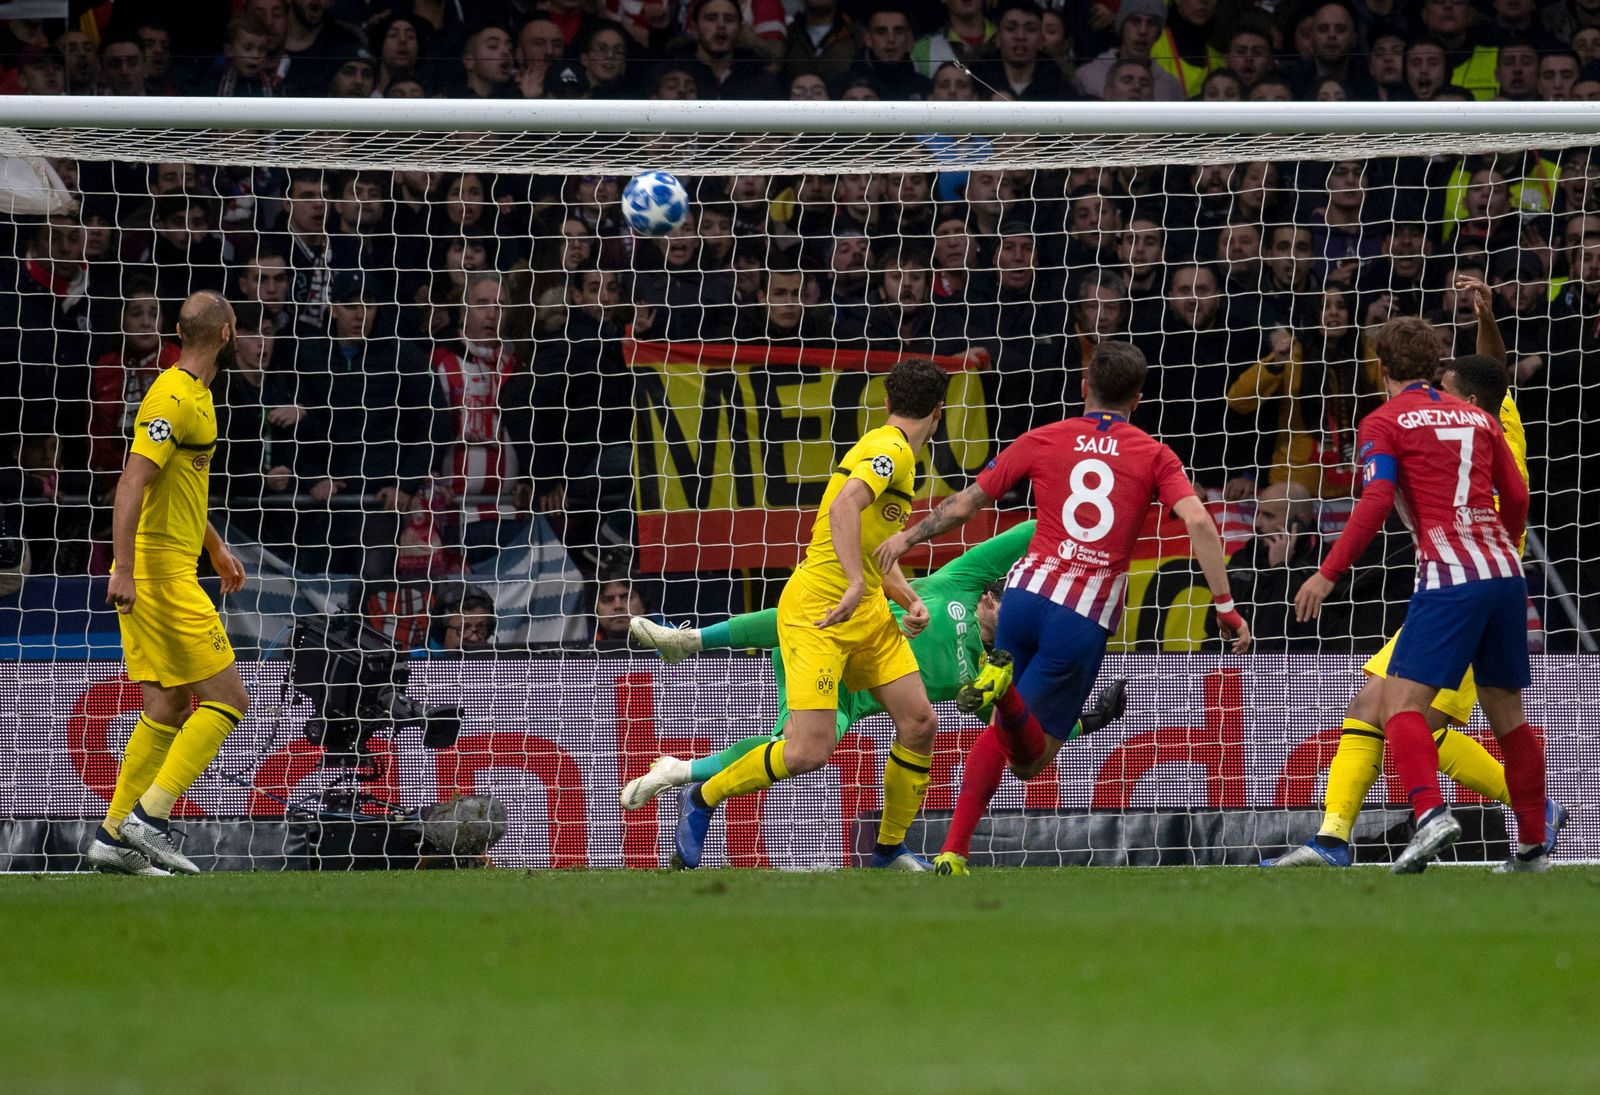 Atlético Madrid - Borussia Dortmund